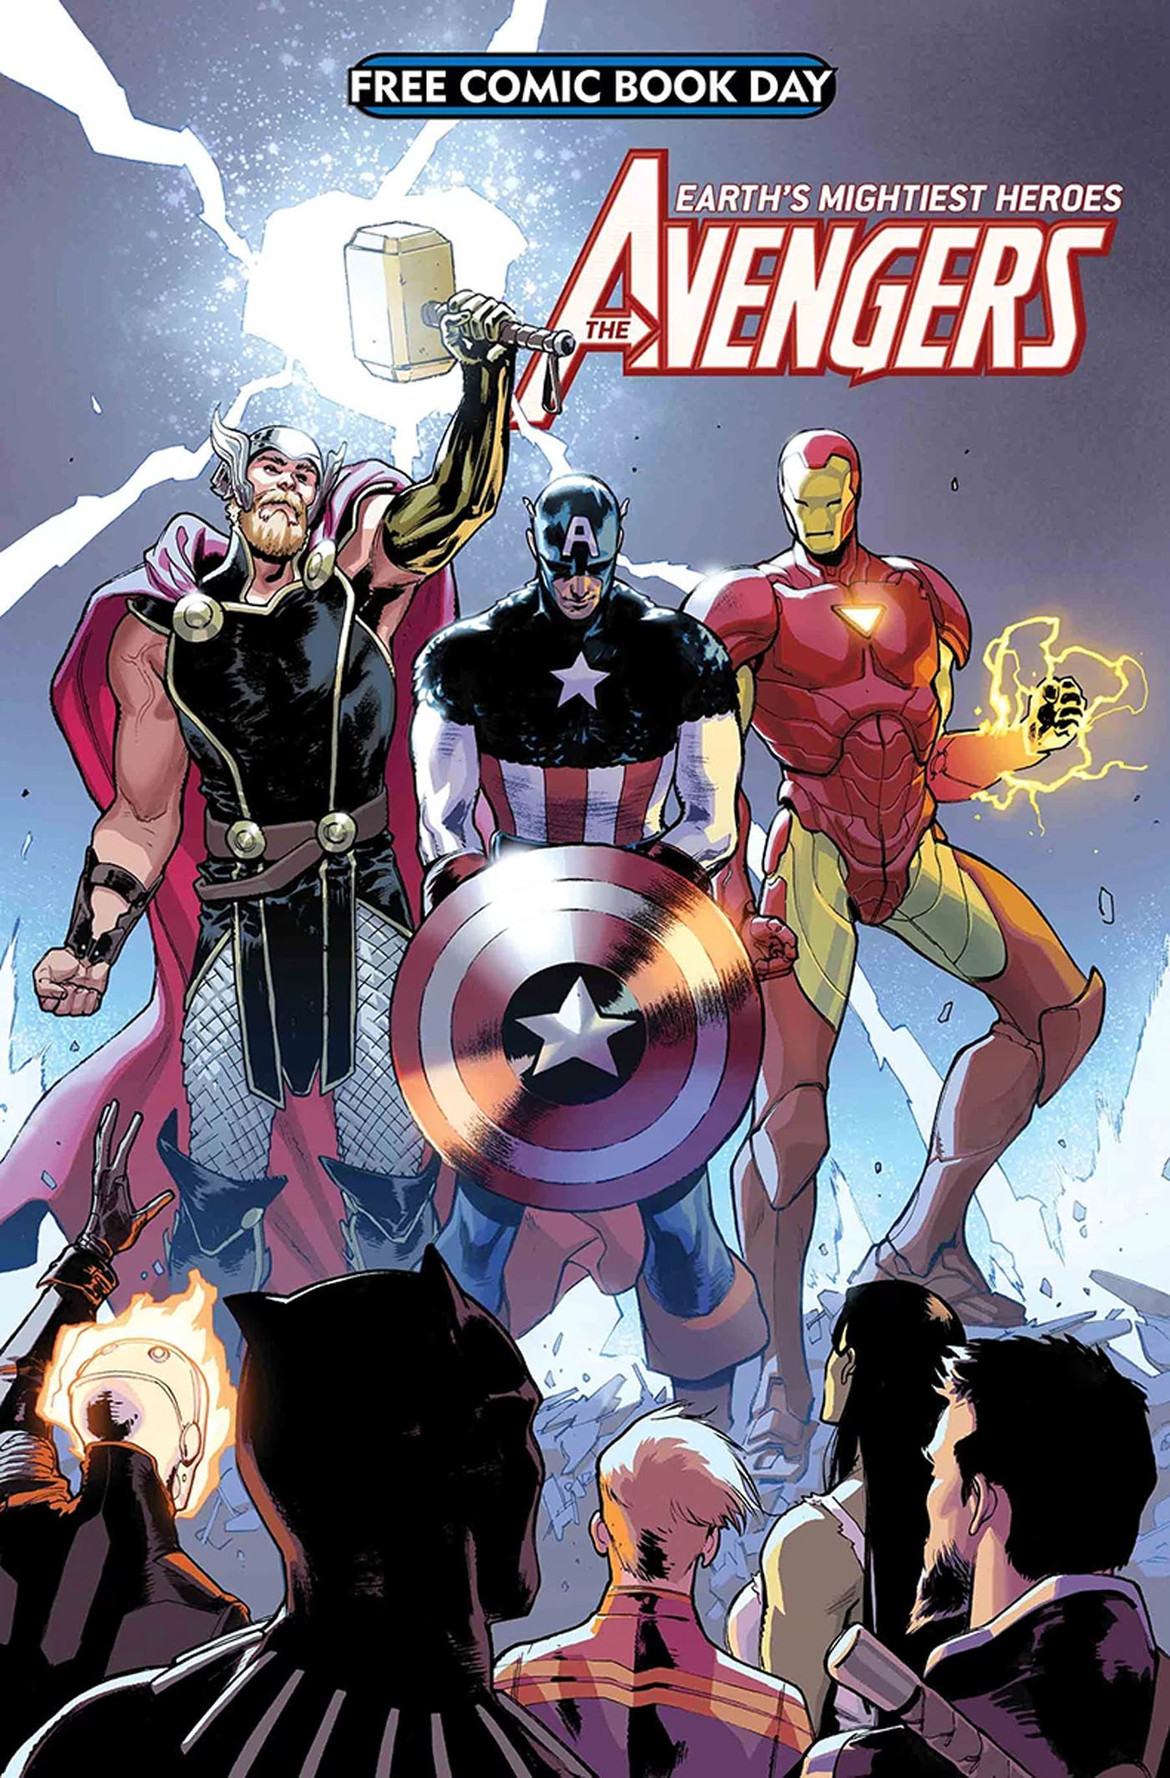 Avengers Captain America FCBD 2018